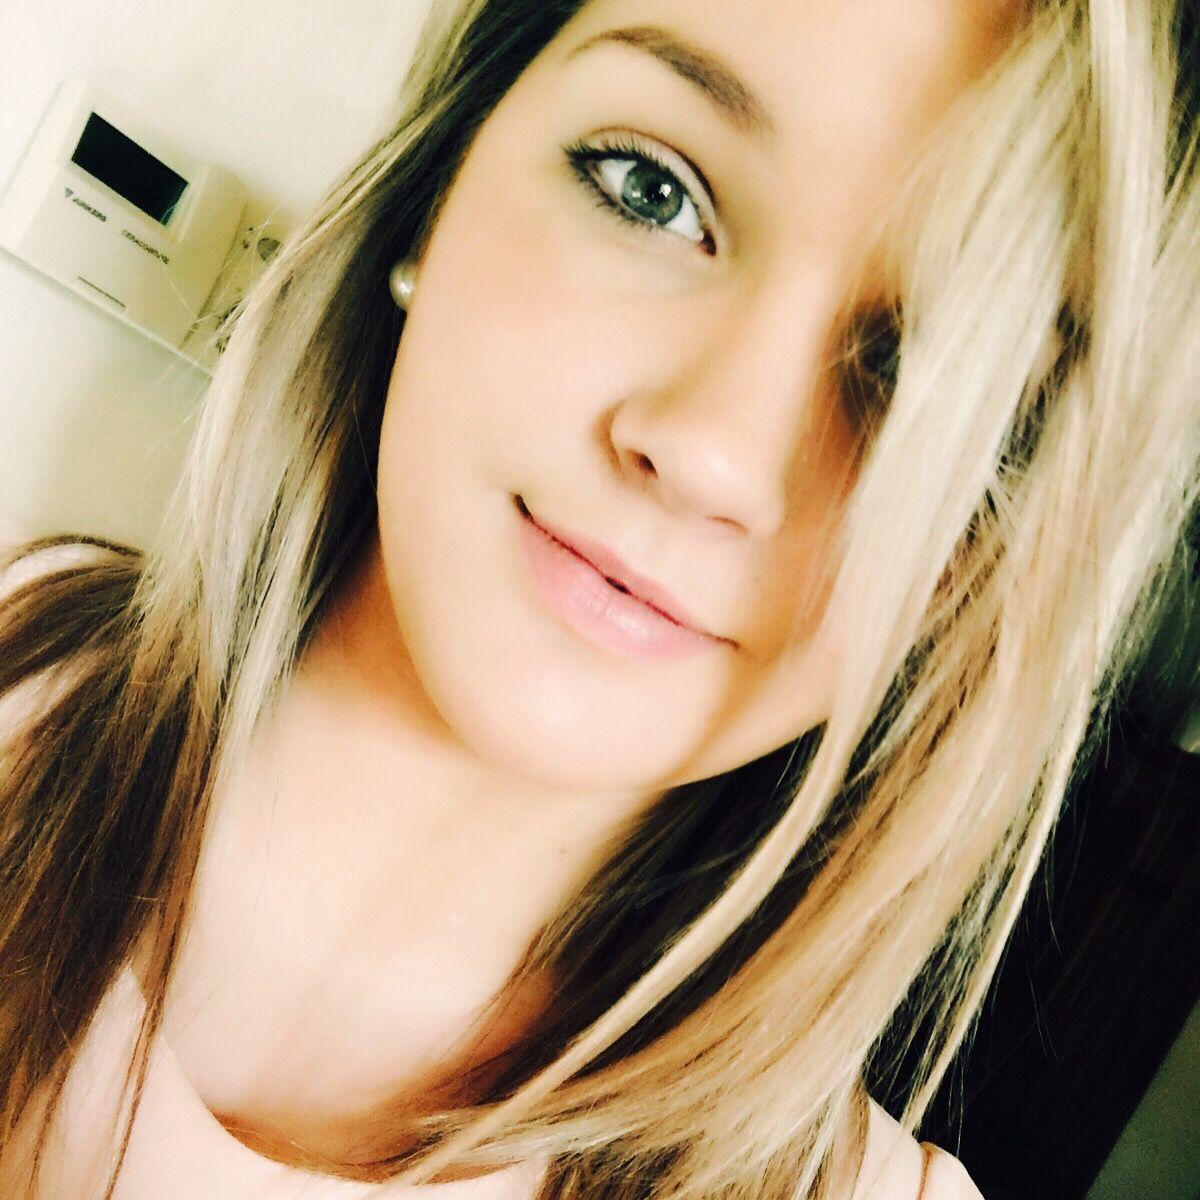 #blondeHair